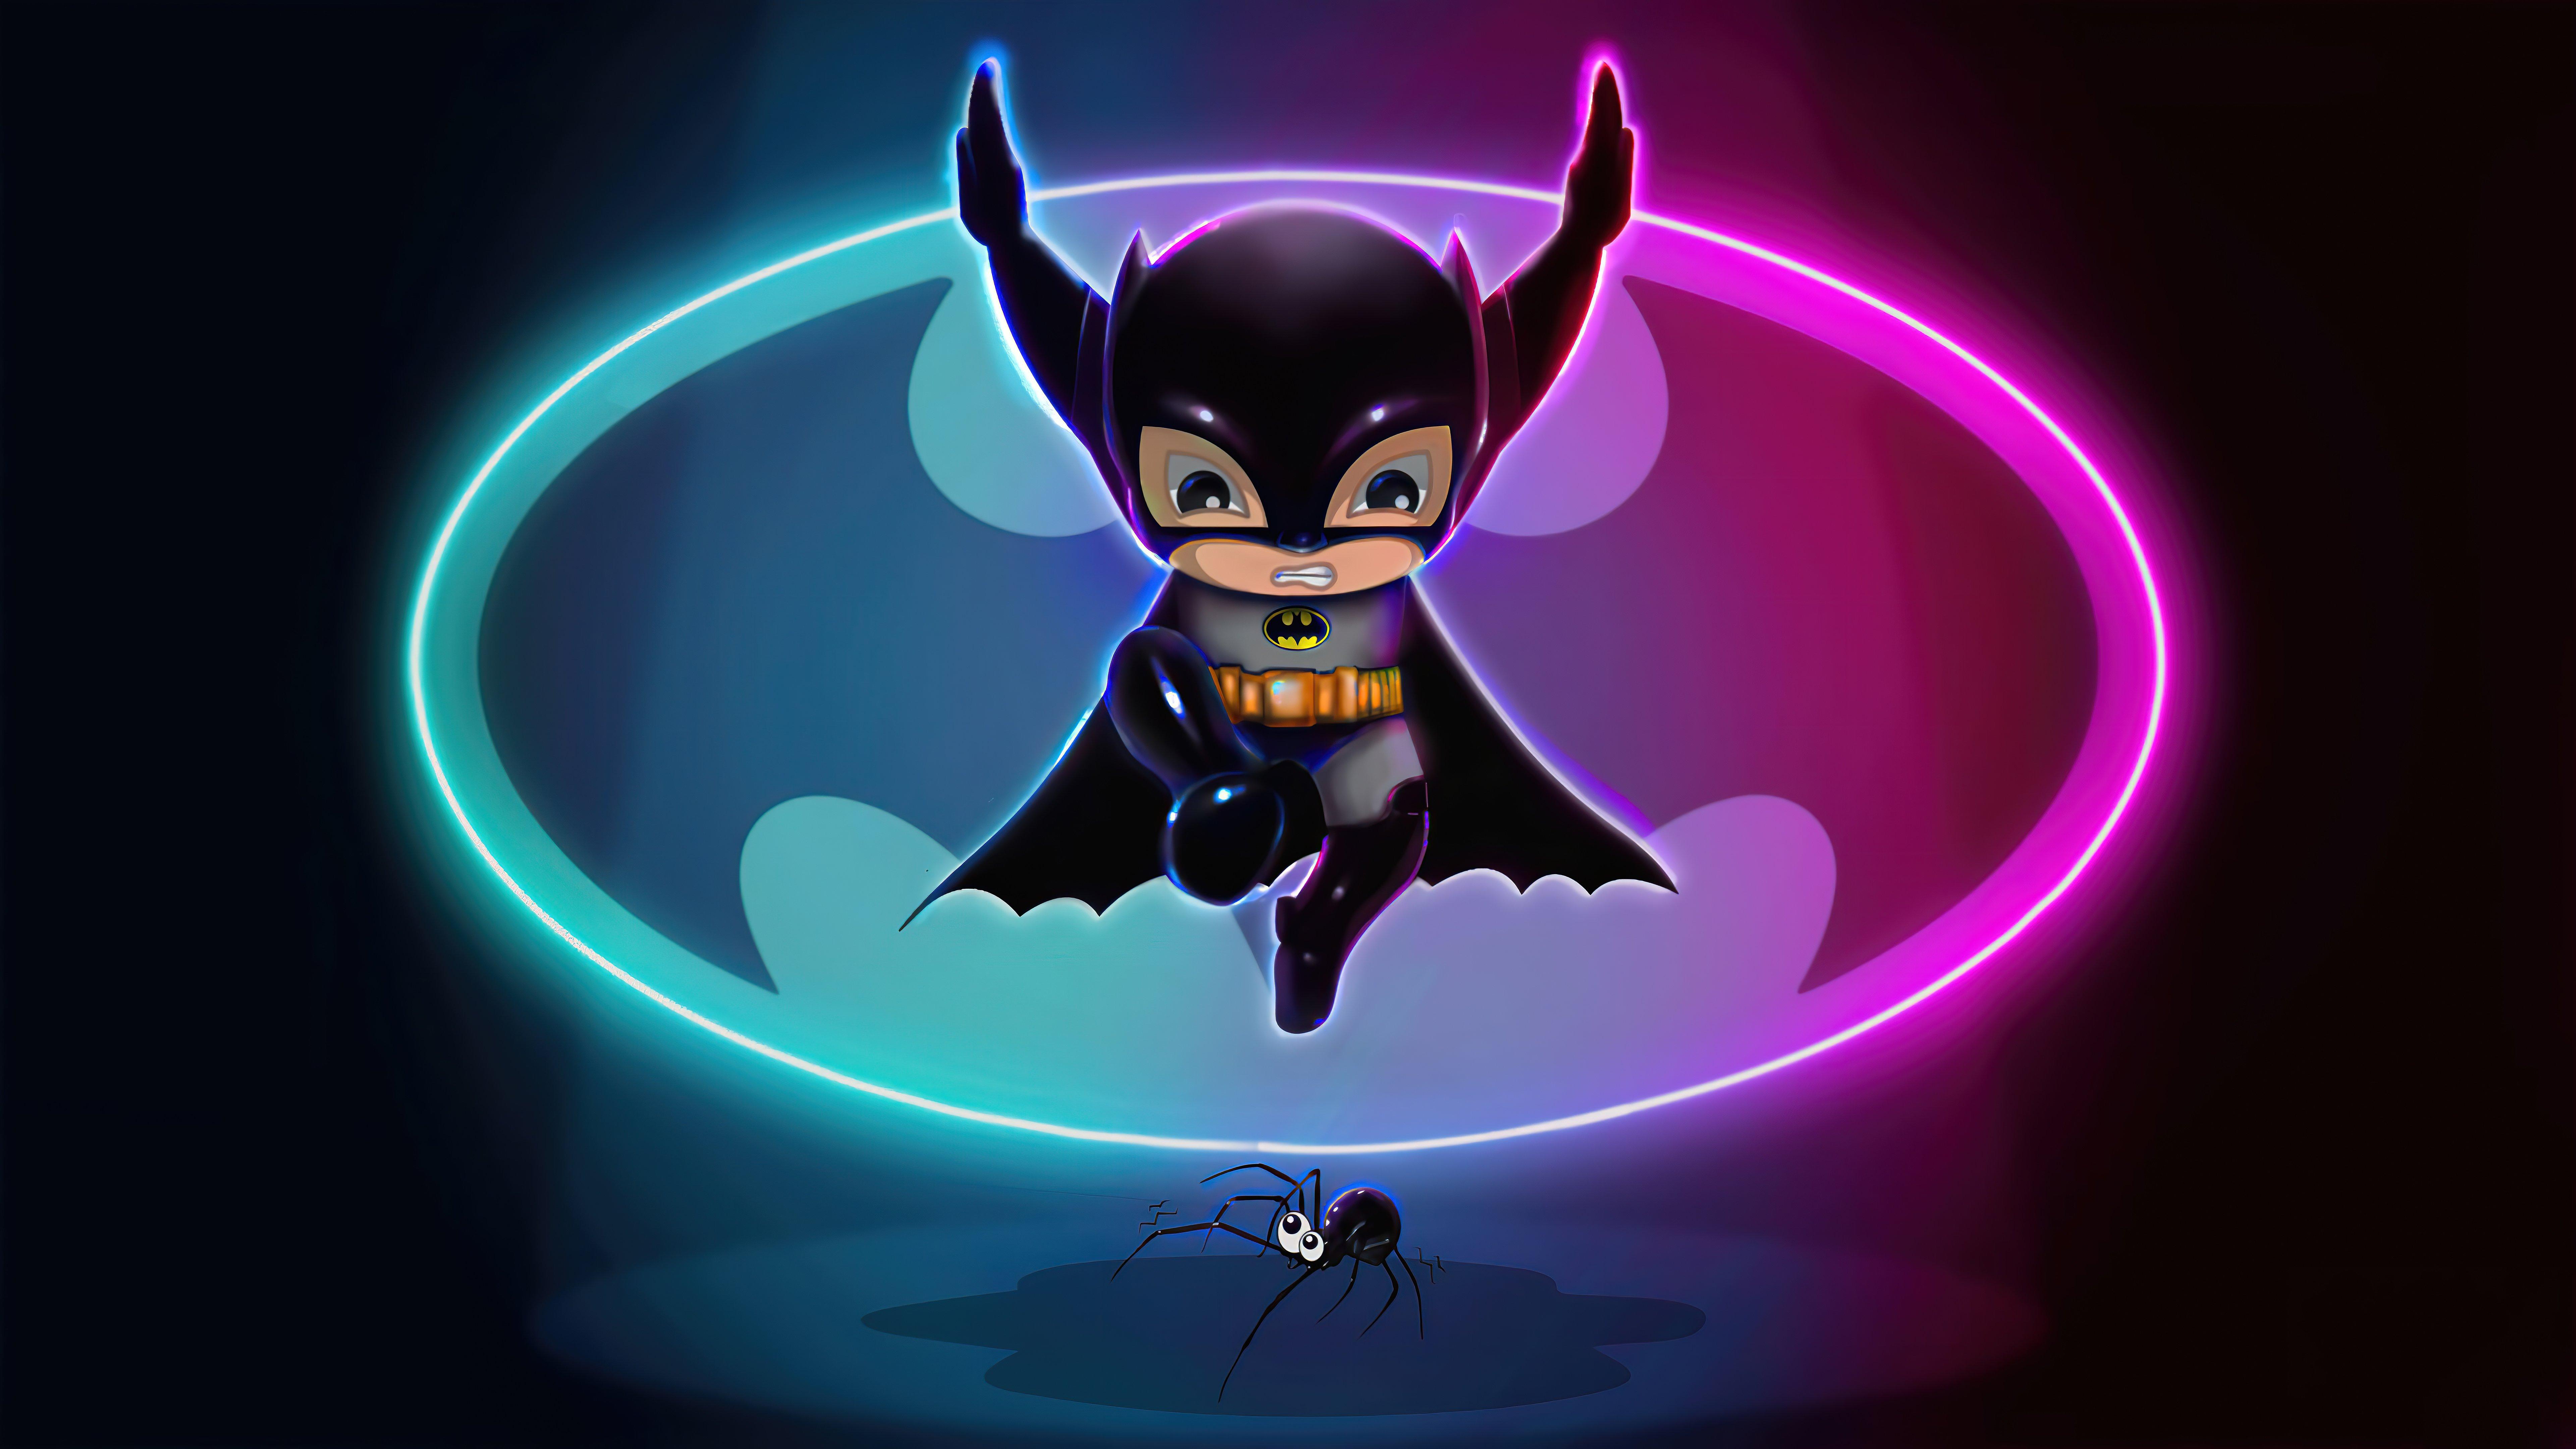 Wallpaper Batman illustration with neon lights